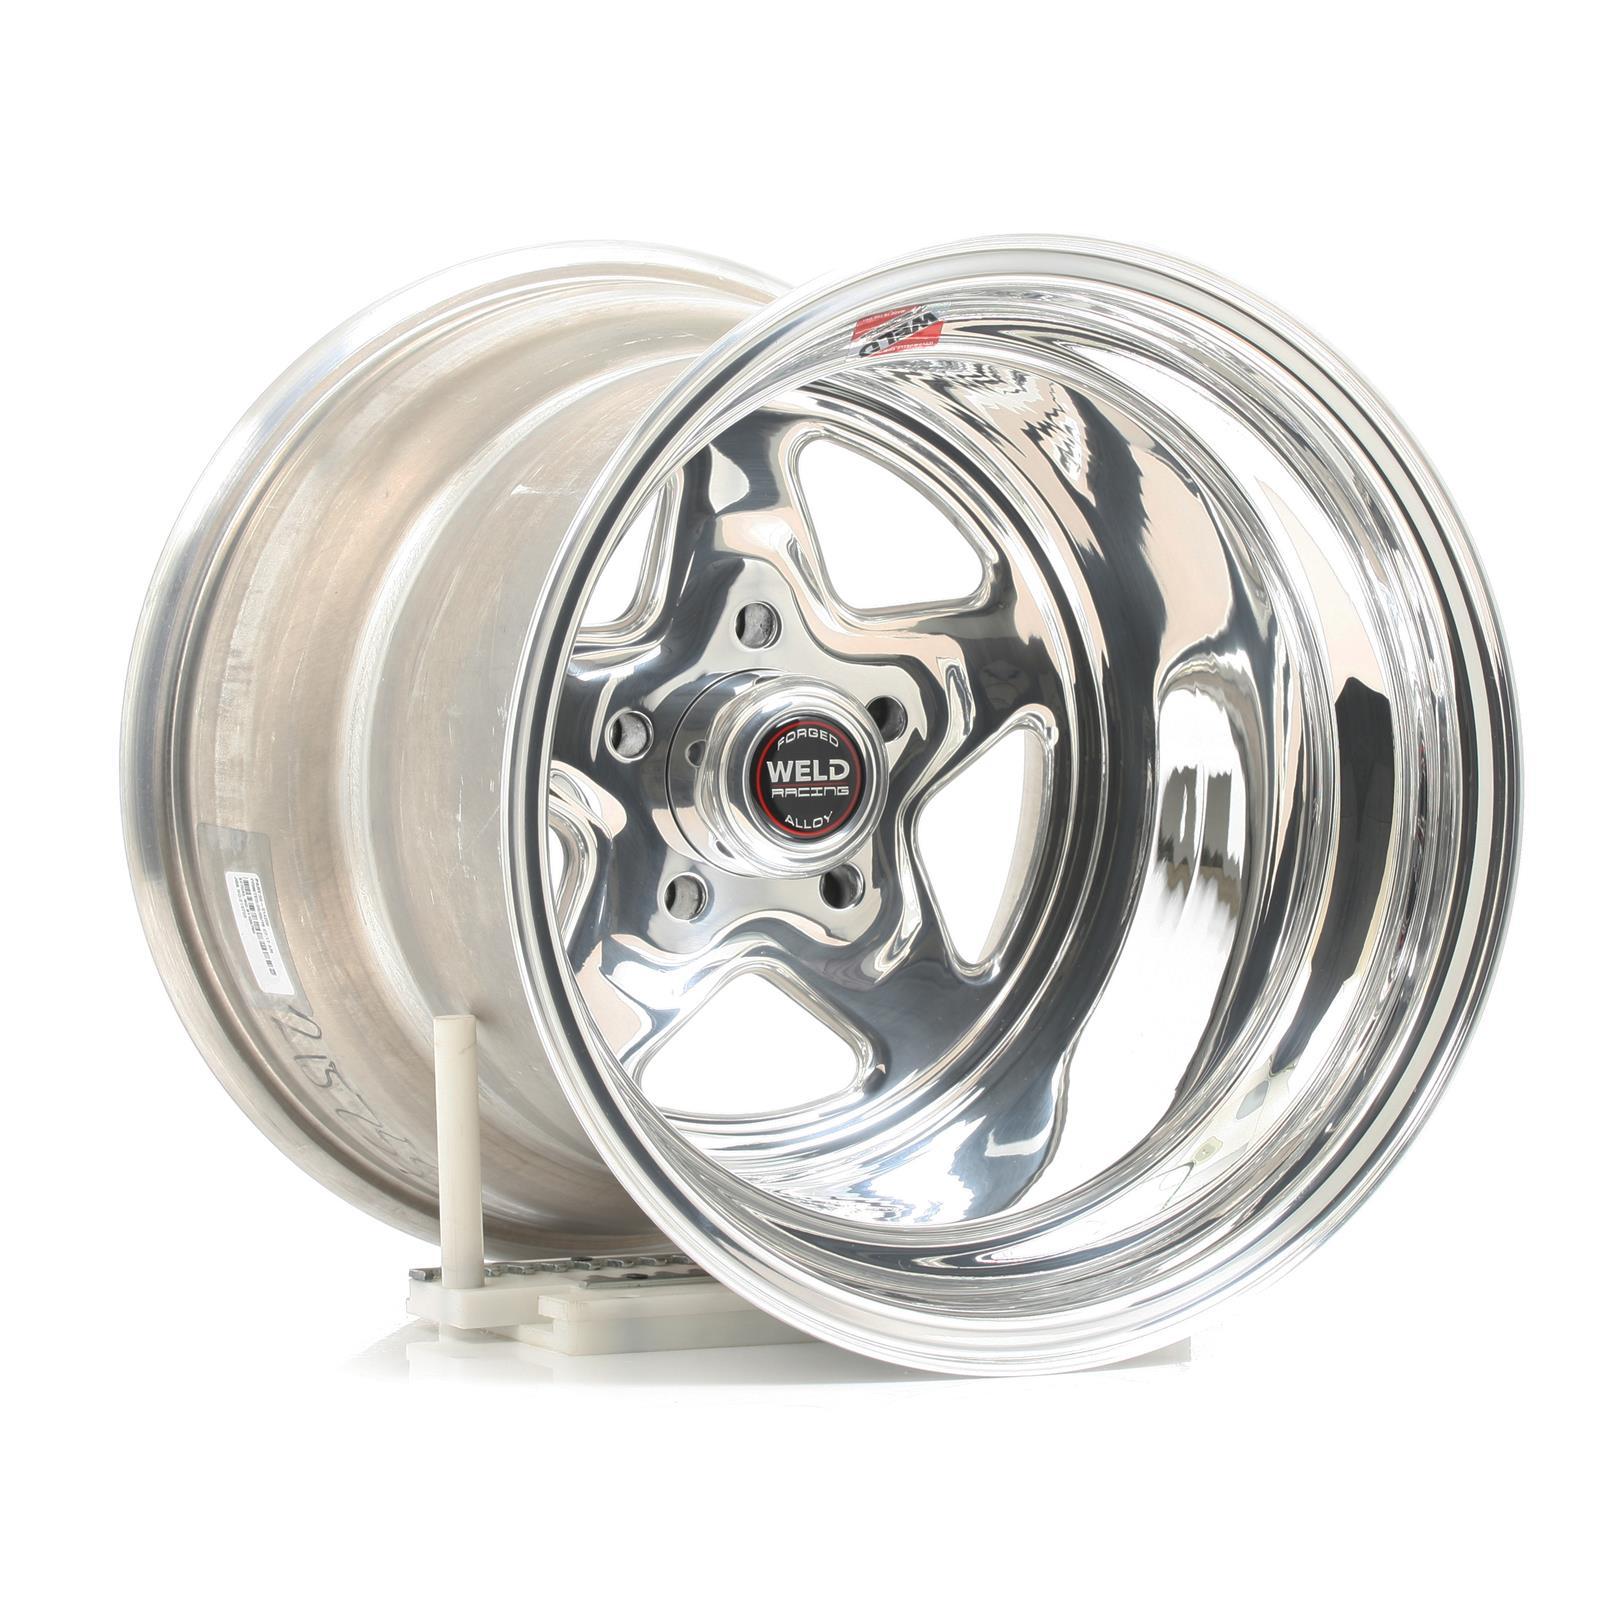 Series 96 Weld Racing Pro Star Polished Aluminum 15 X 10 Inch Wheel